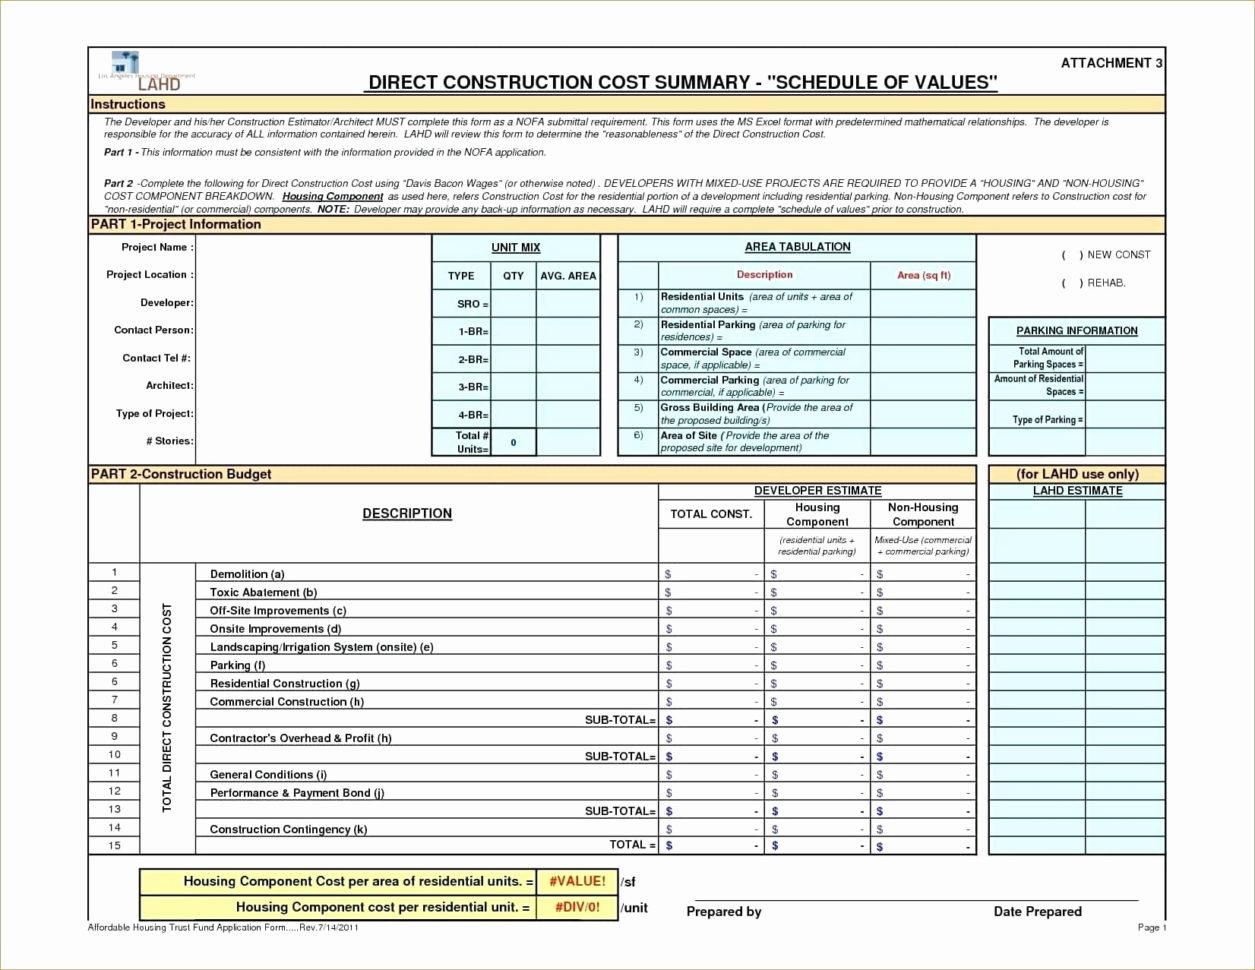 Free Construction Schedule Spreadsheet Throughout Free Construction Schedule Spreadsheet Or Construction Estimate